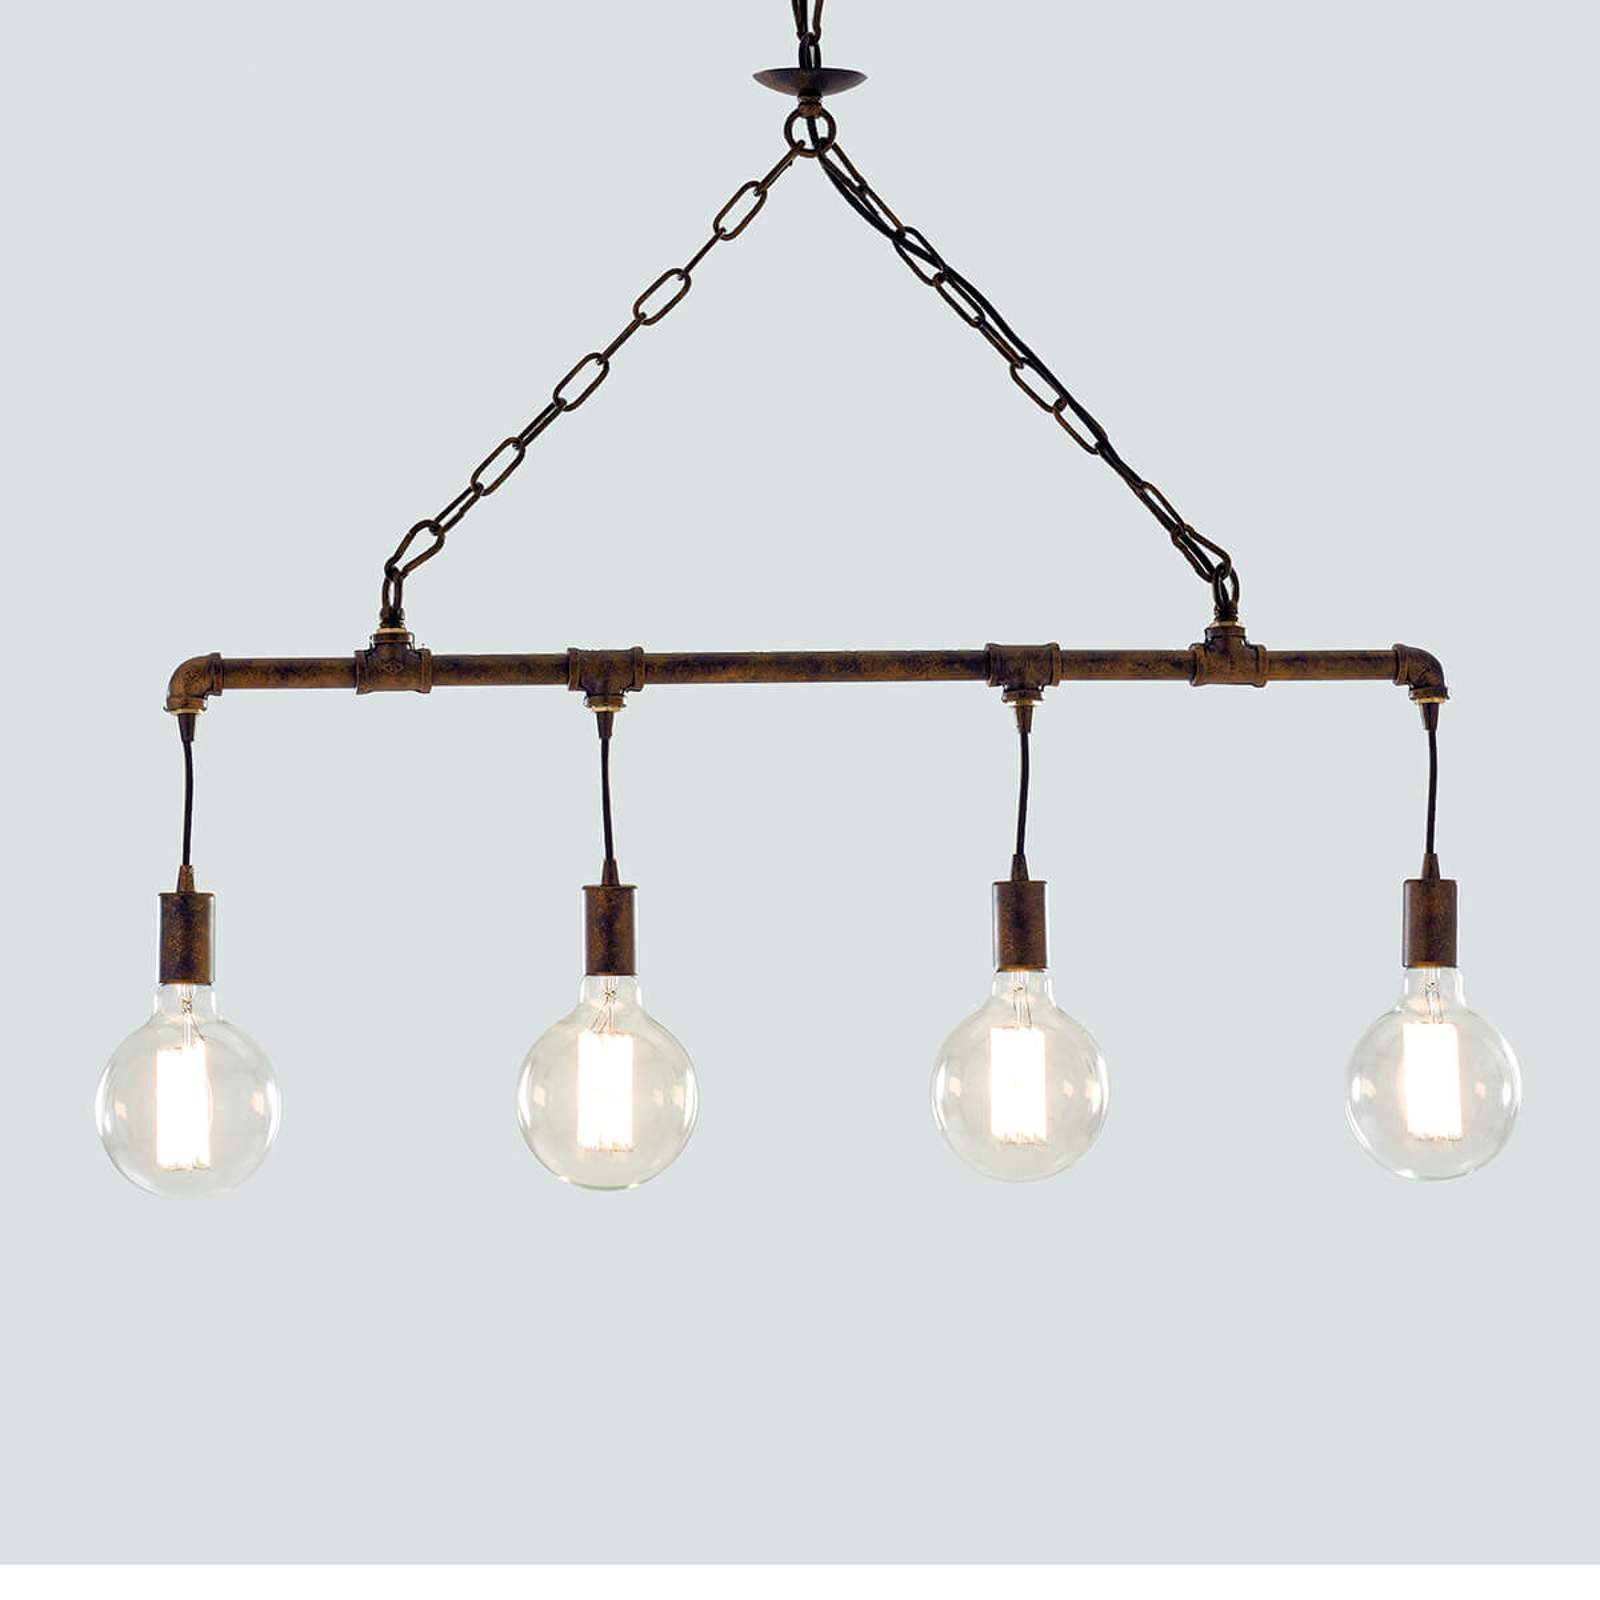 Industrialna lampa wisząca Amarcord